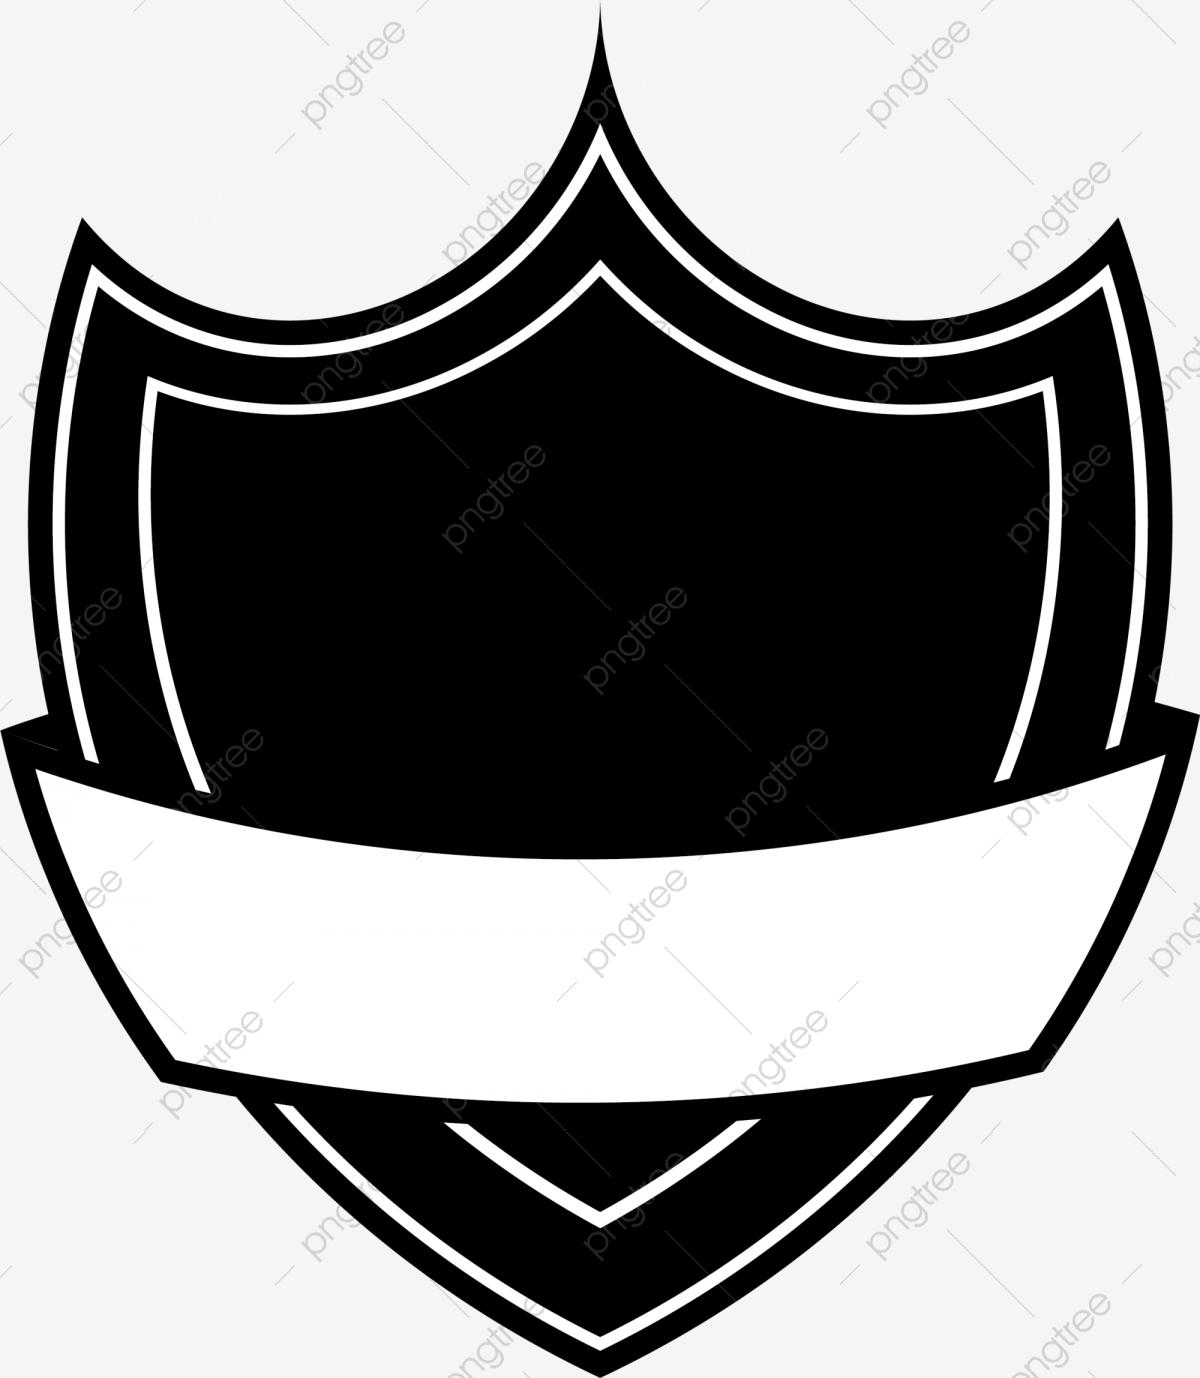 Escudo Negro Minimalista, Black, Simple, Escudo Imagen PNG para.